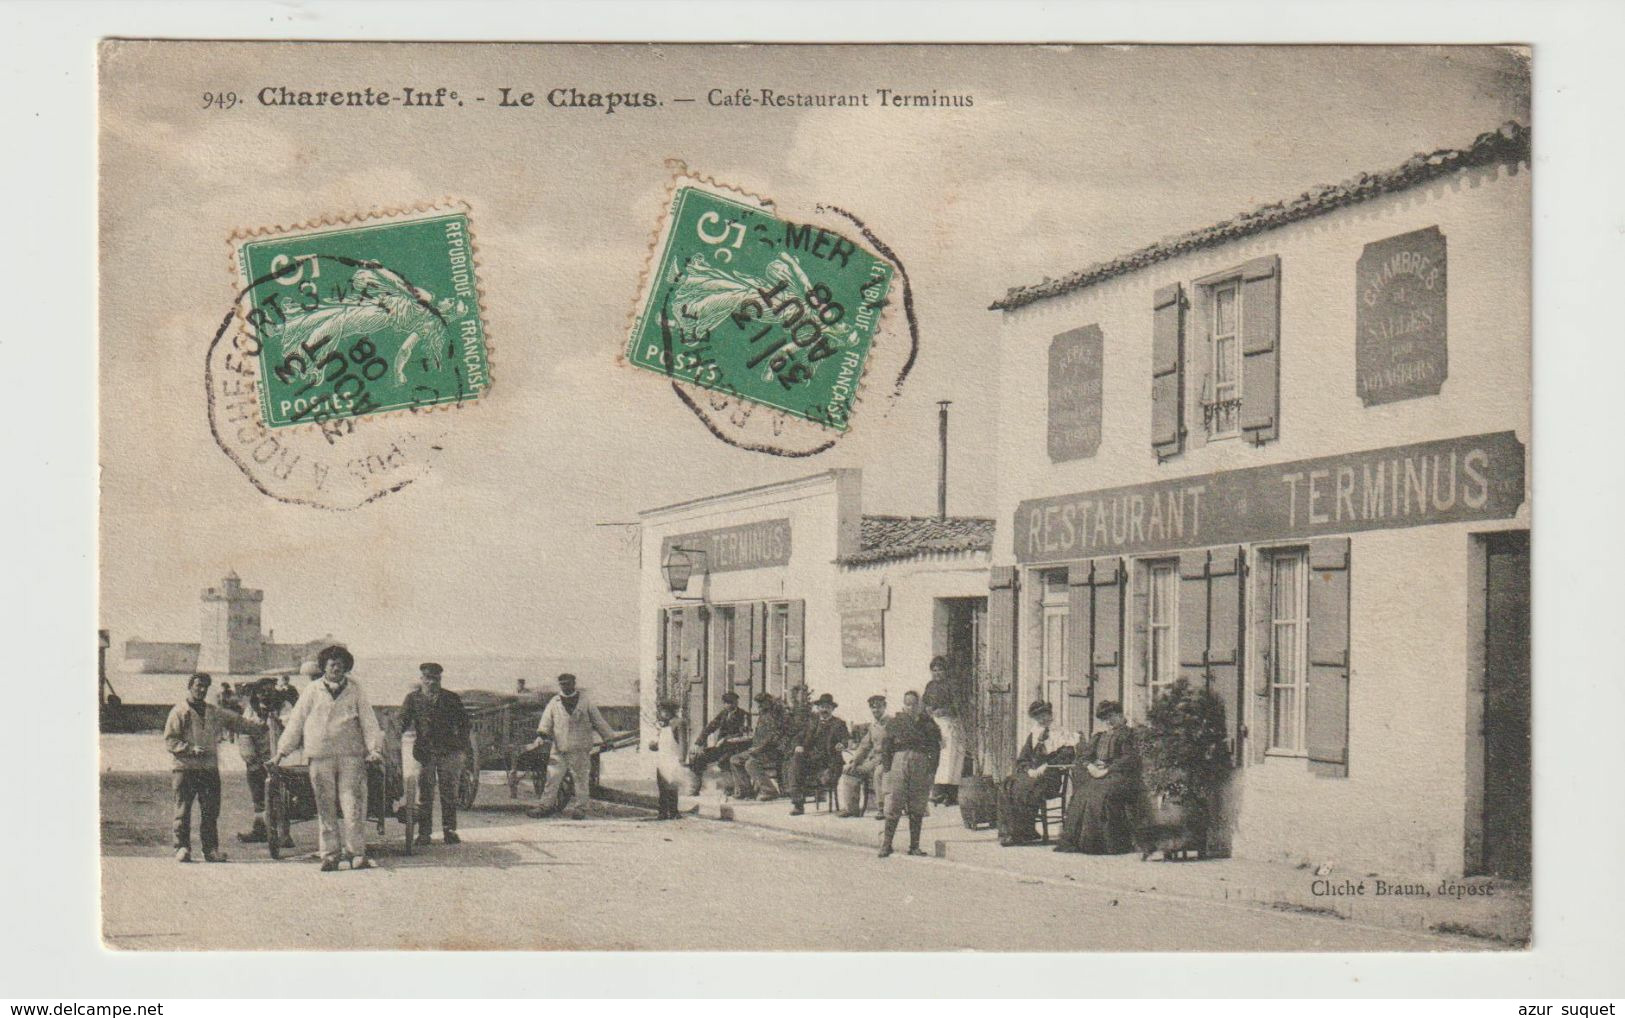 FRANCE / CPA / LE CHAPUS / CAFE RESTAURANT TERMINUS / CACHETS CONVOYEURS / 1908 - Andere Gemeenten